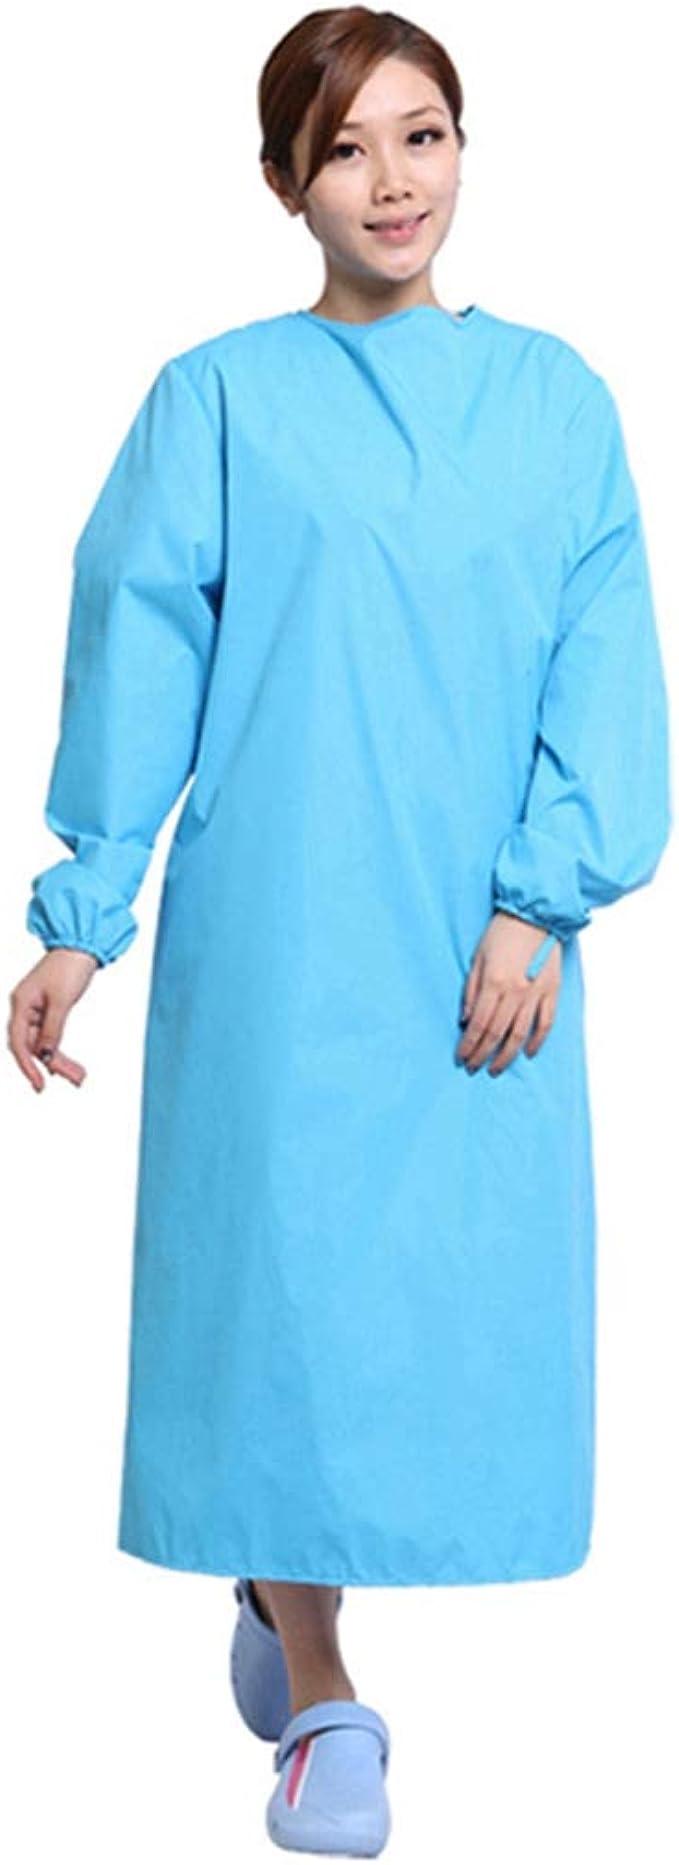 Amazon.com: Yuena - Disfraz de aislamiento quirúrgico para ...